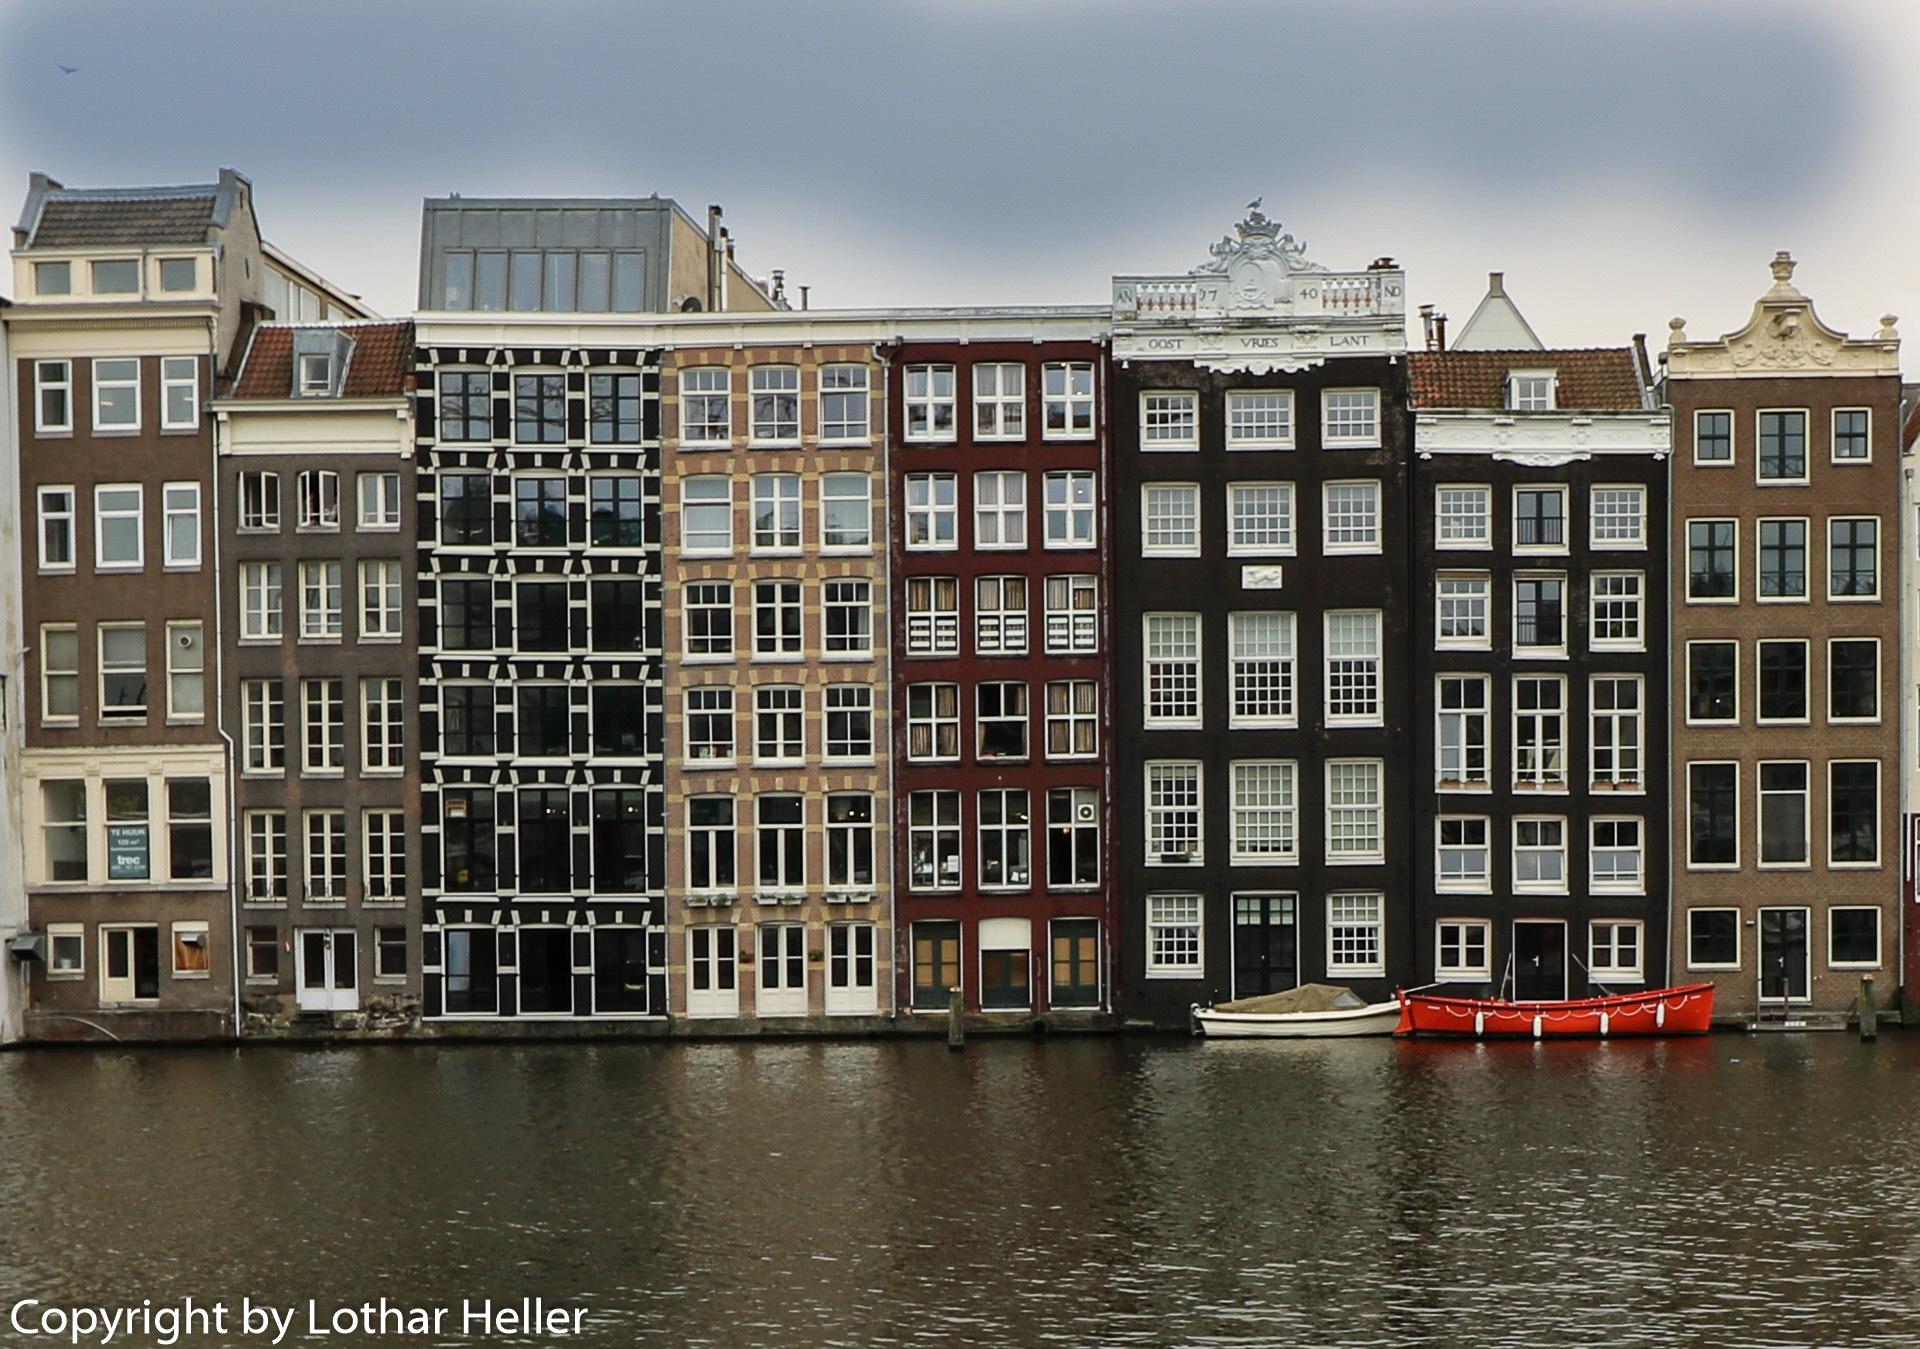 Amsterdam Houses by Lothar Heller